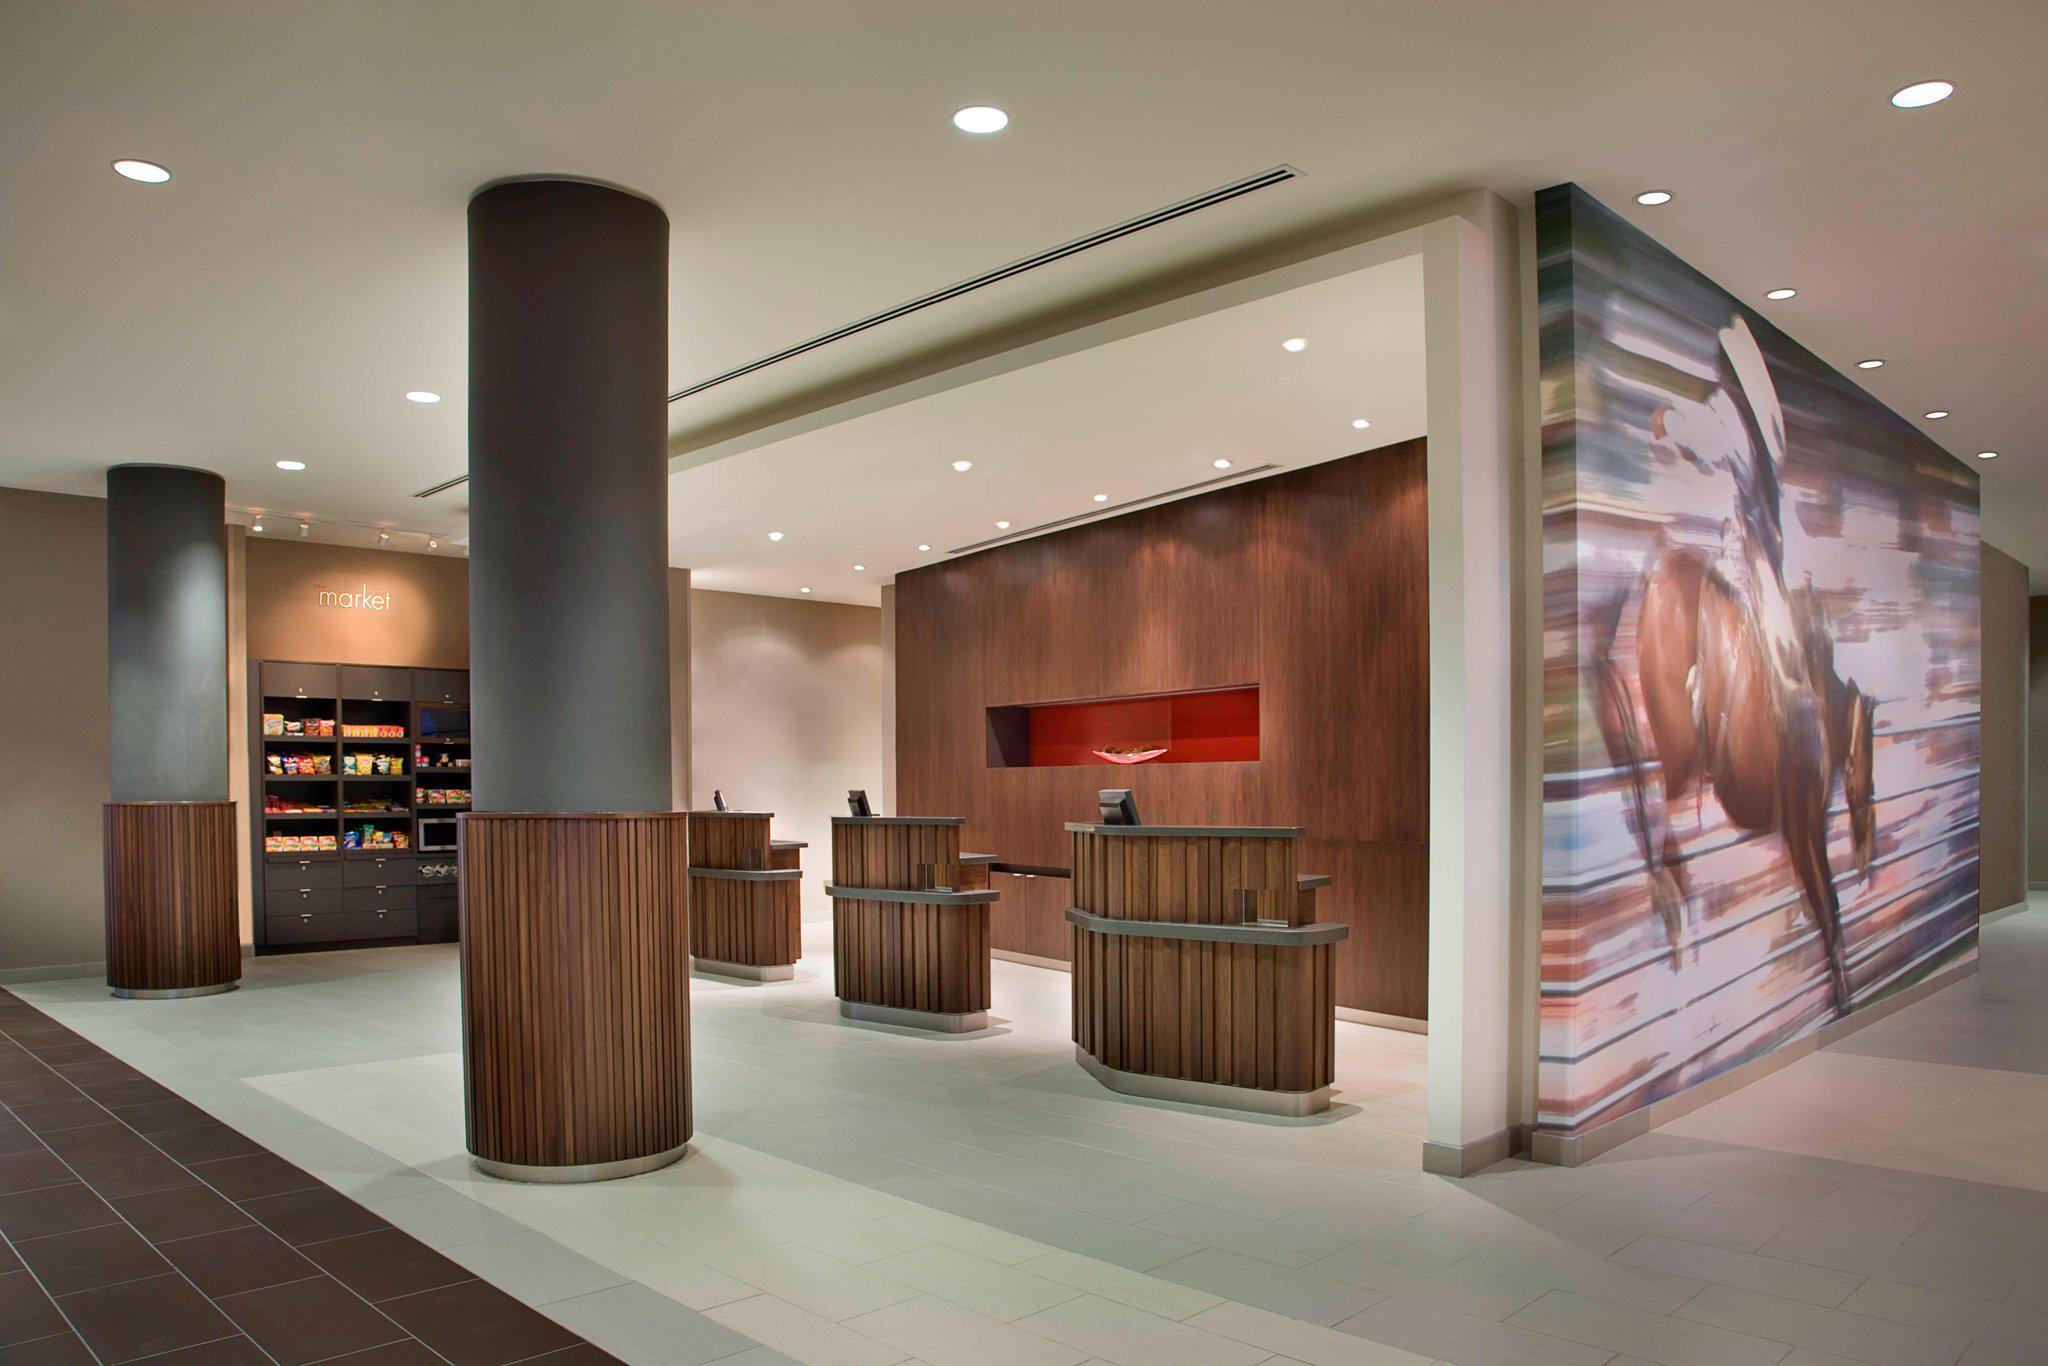 Courtyard by Marriott Calgary Airport